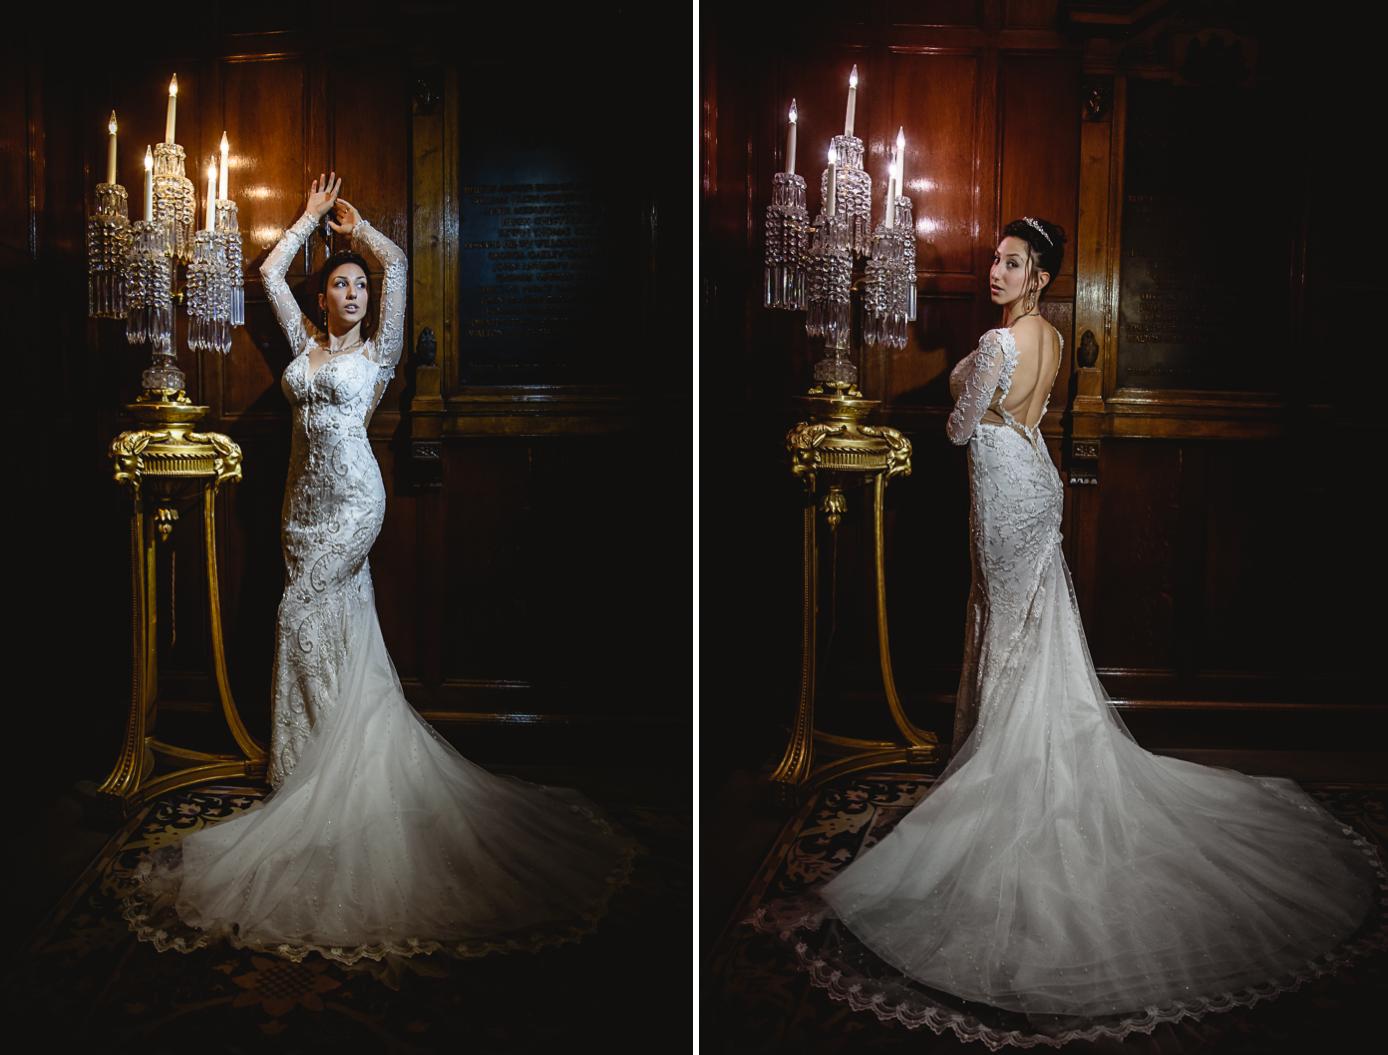 iranian wedding photographer 250 - Drapers Hall London Wedding Photographer